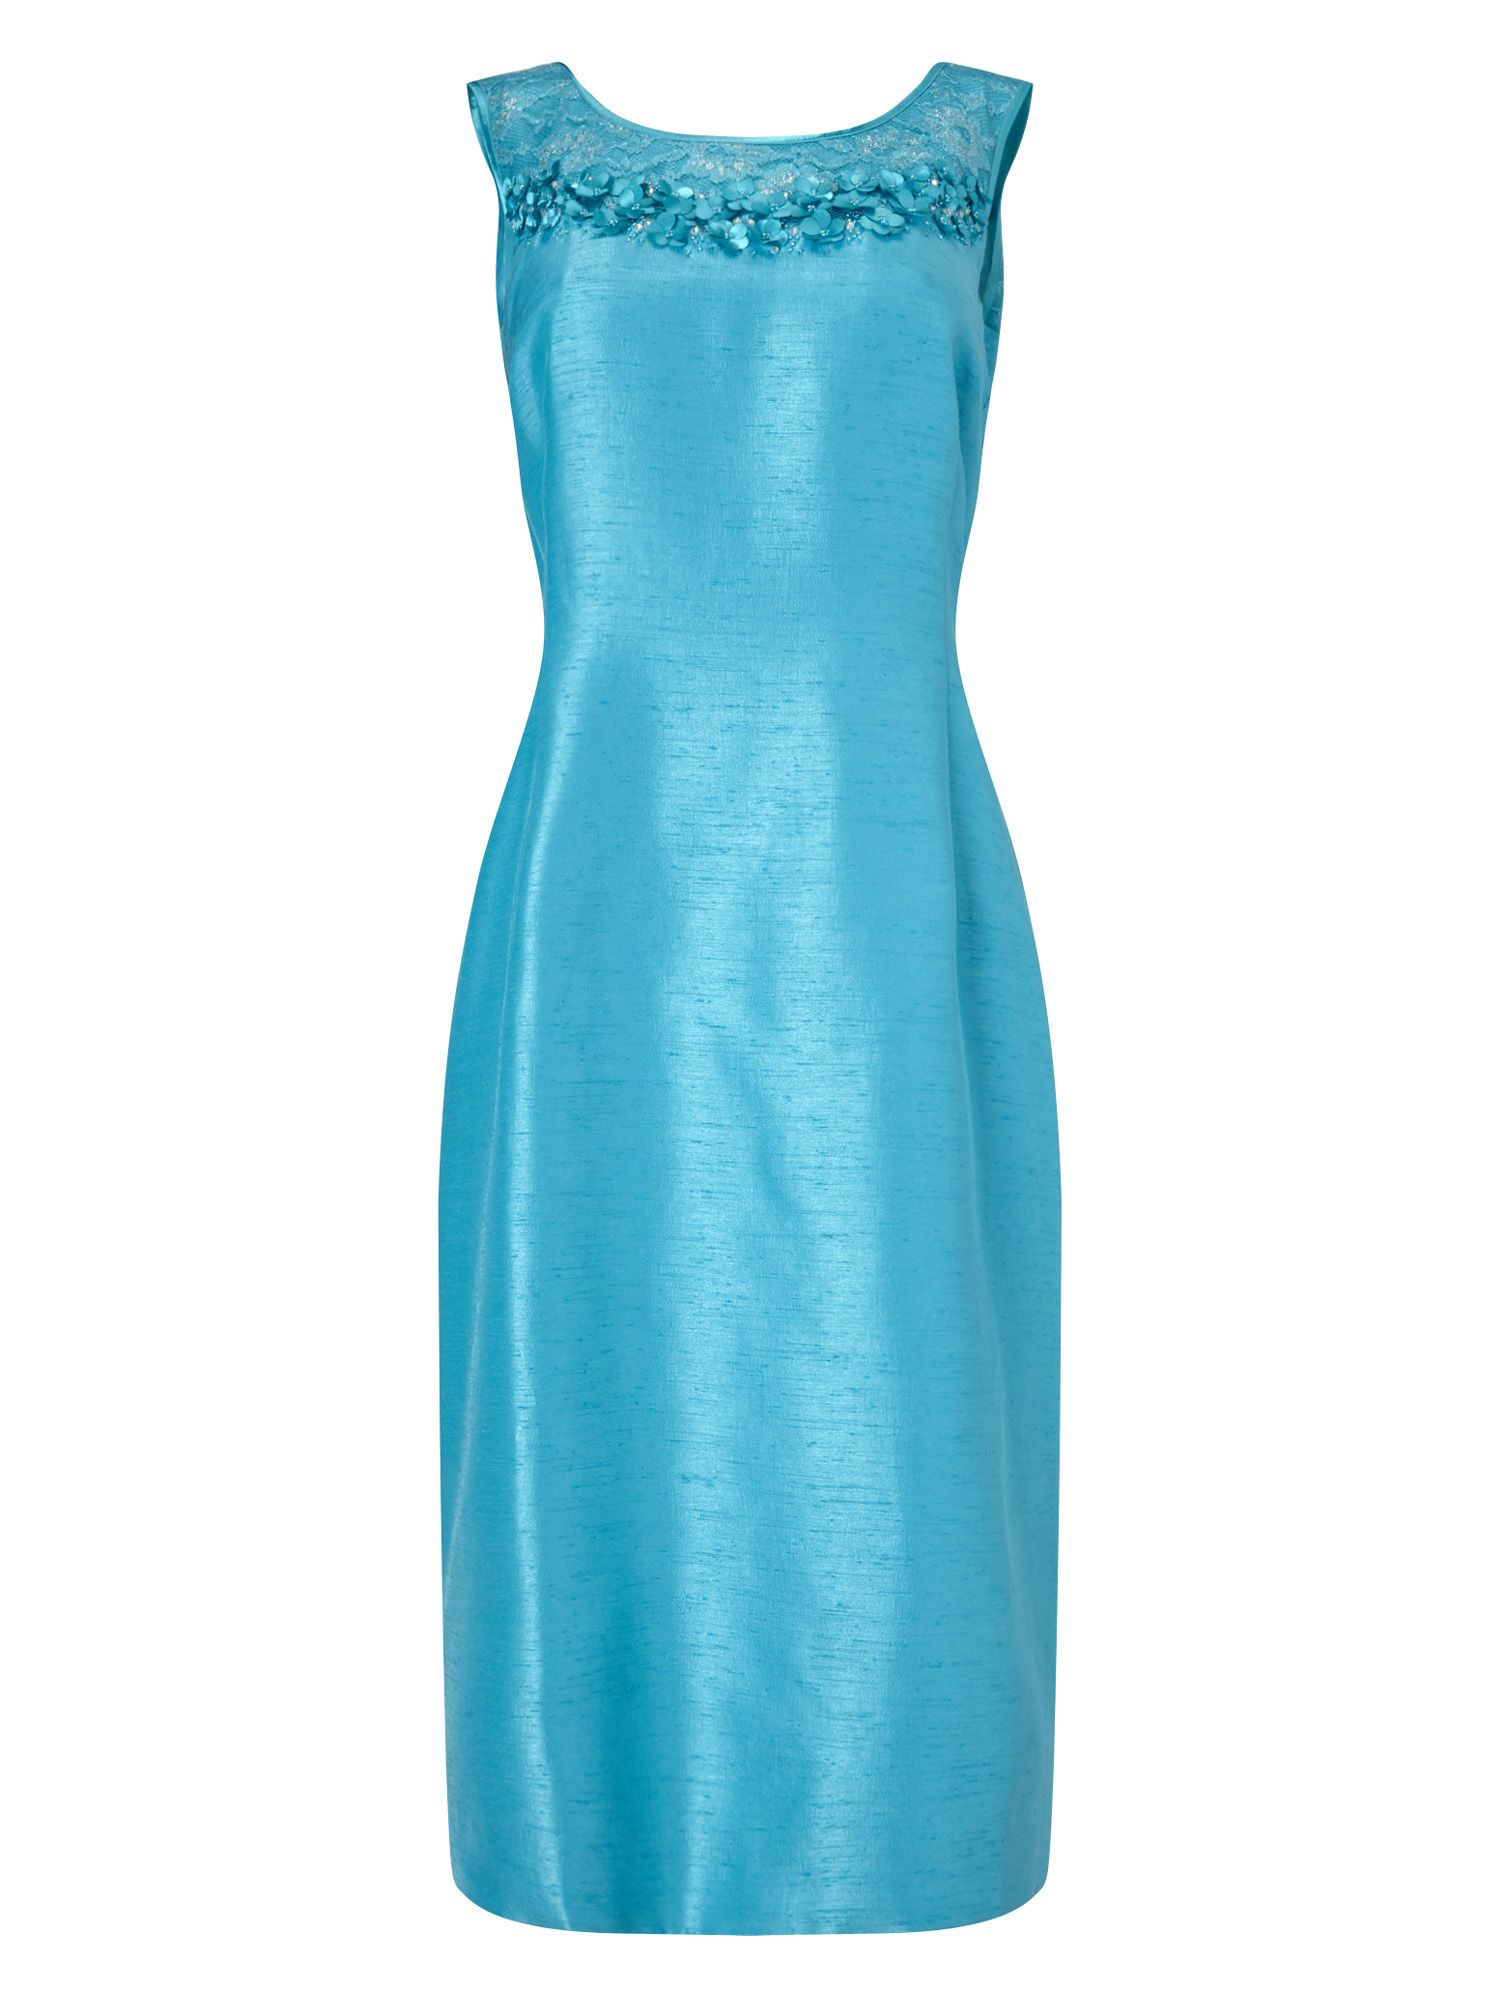 Jacques Vert Embellished Yolk Dress | Spring Wedding Outfits ...